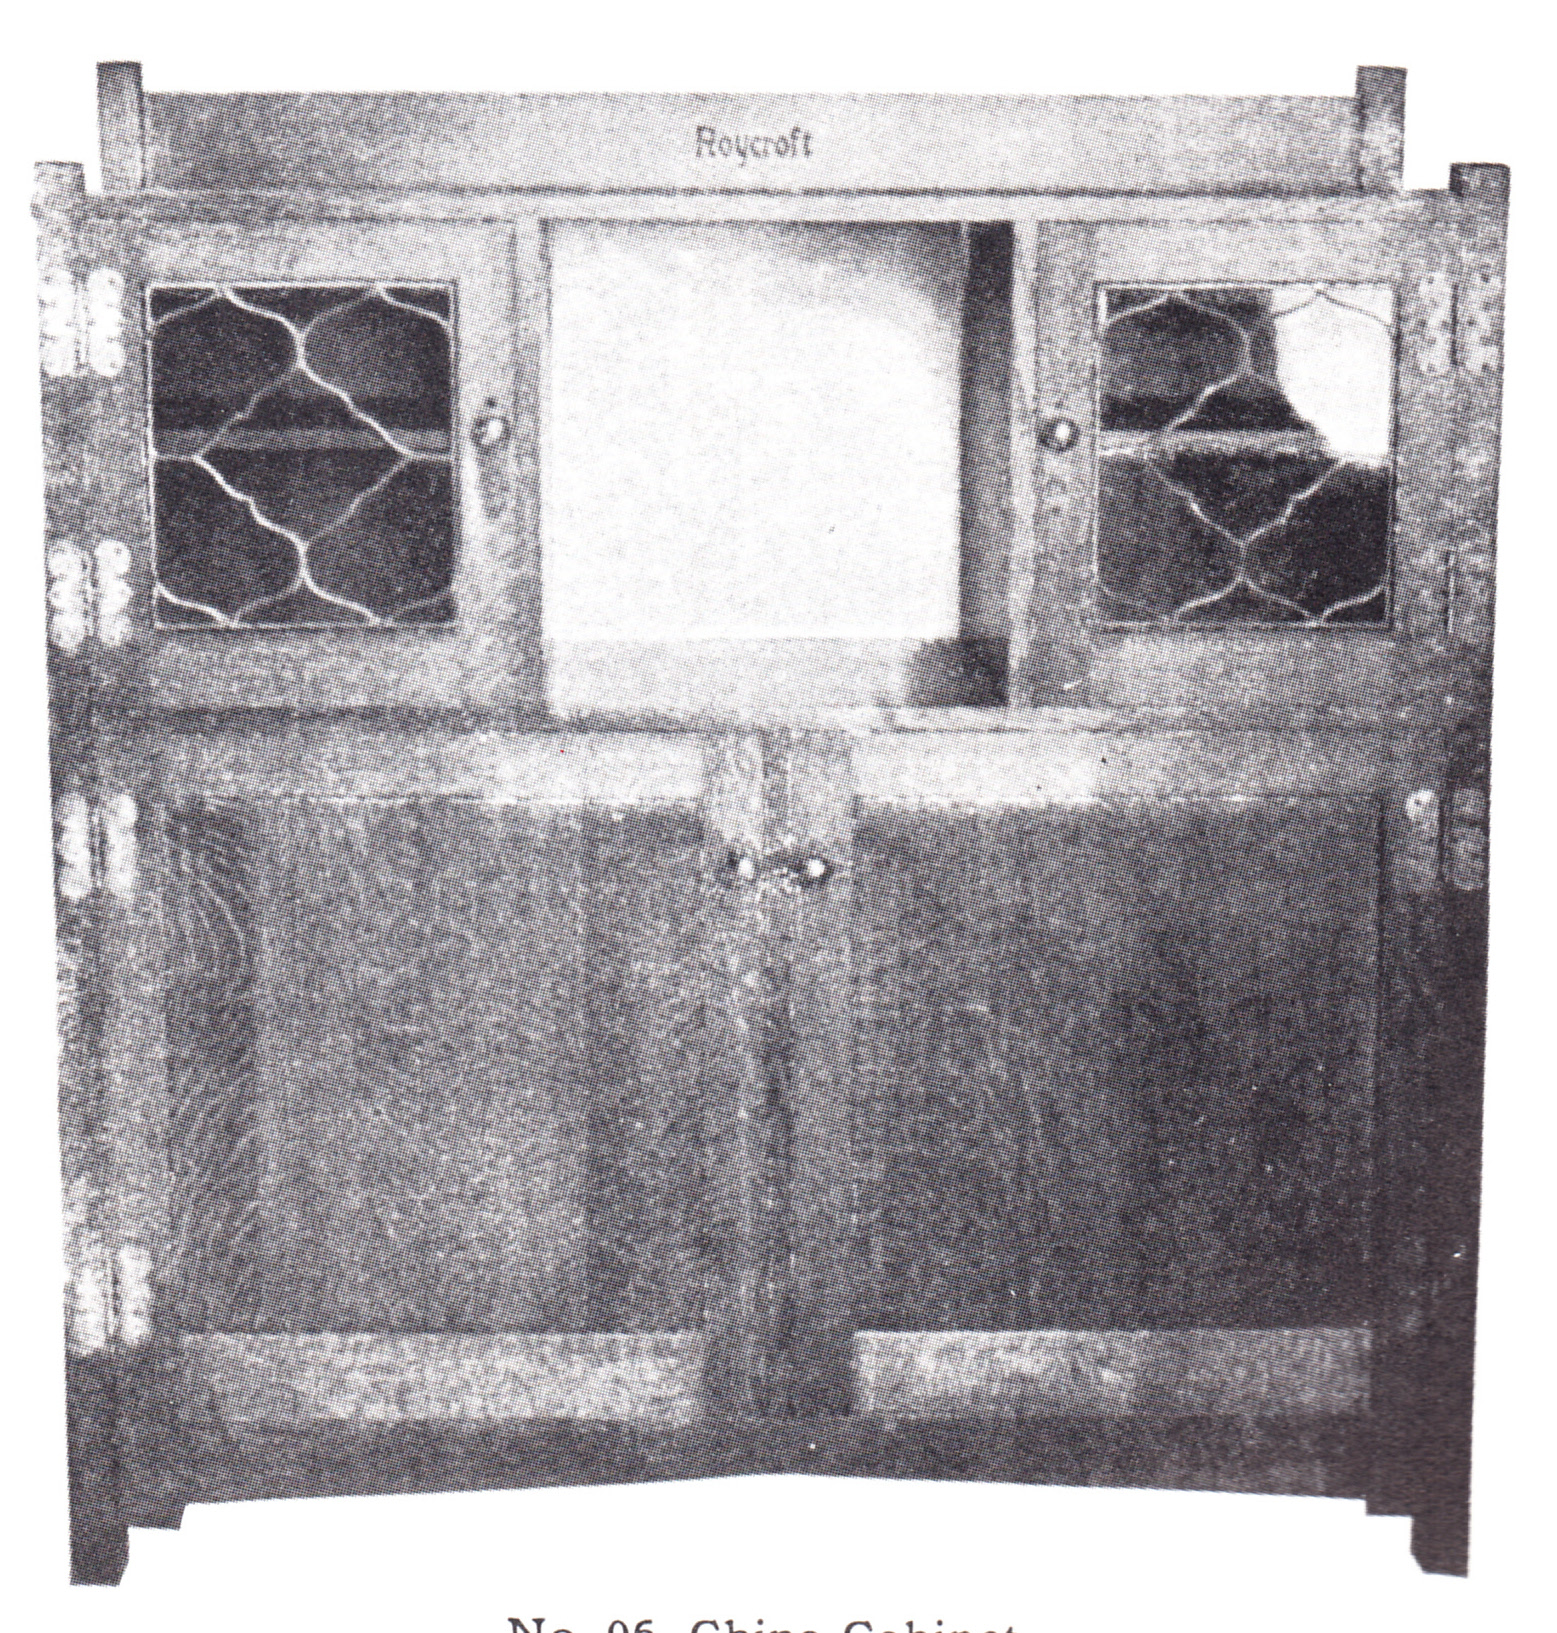 Furniture - Roycroft - 06-M - China Cabinet, Mahogany